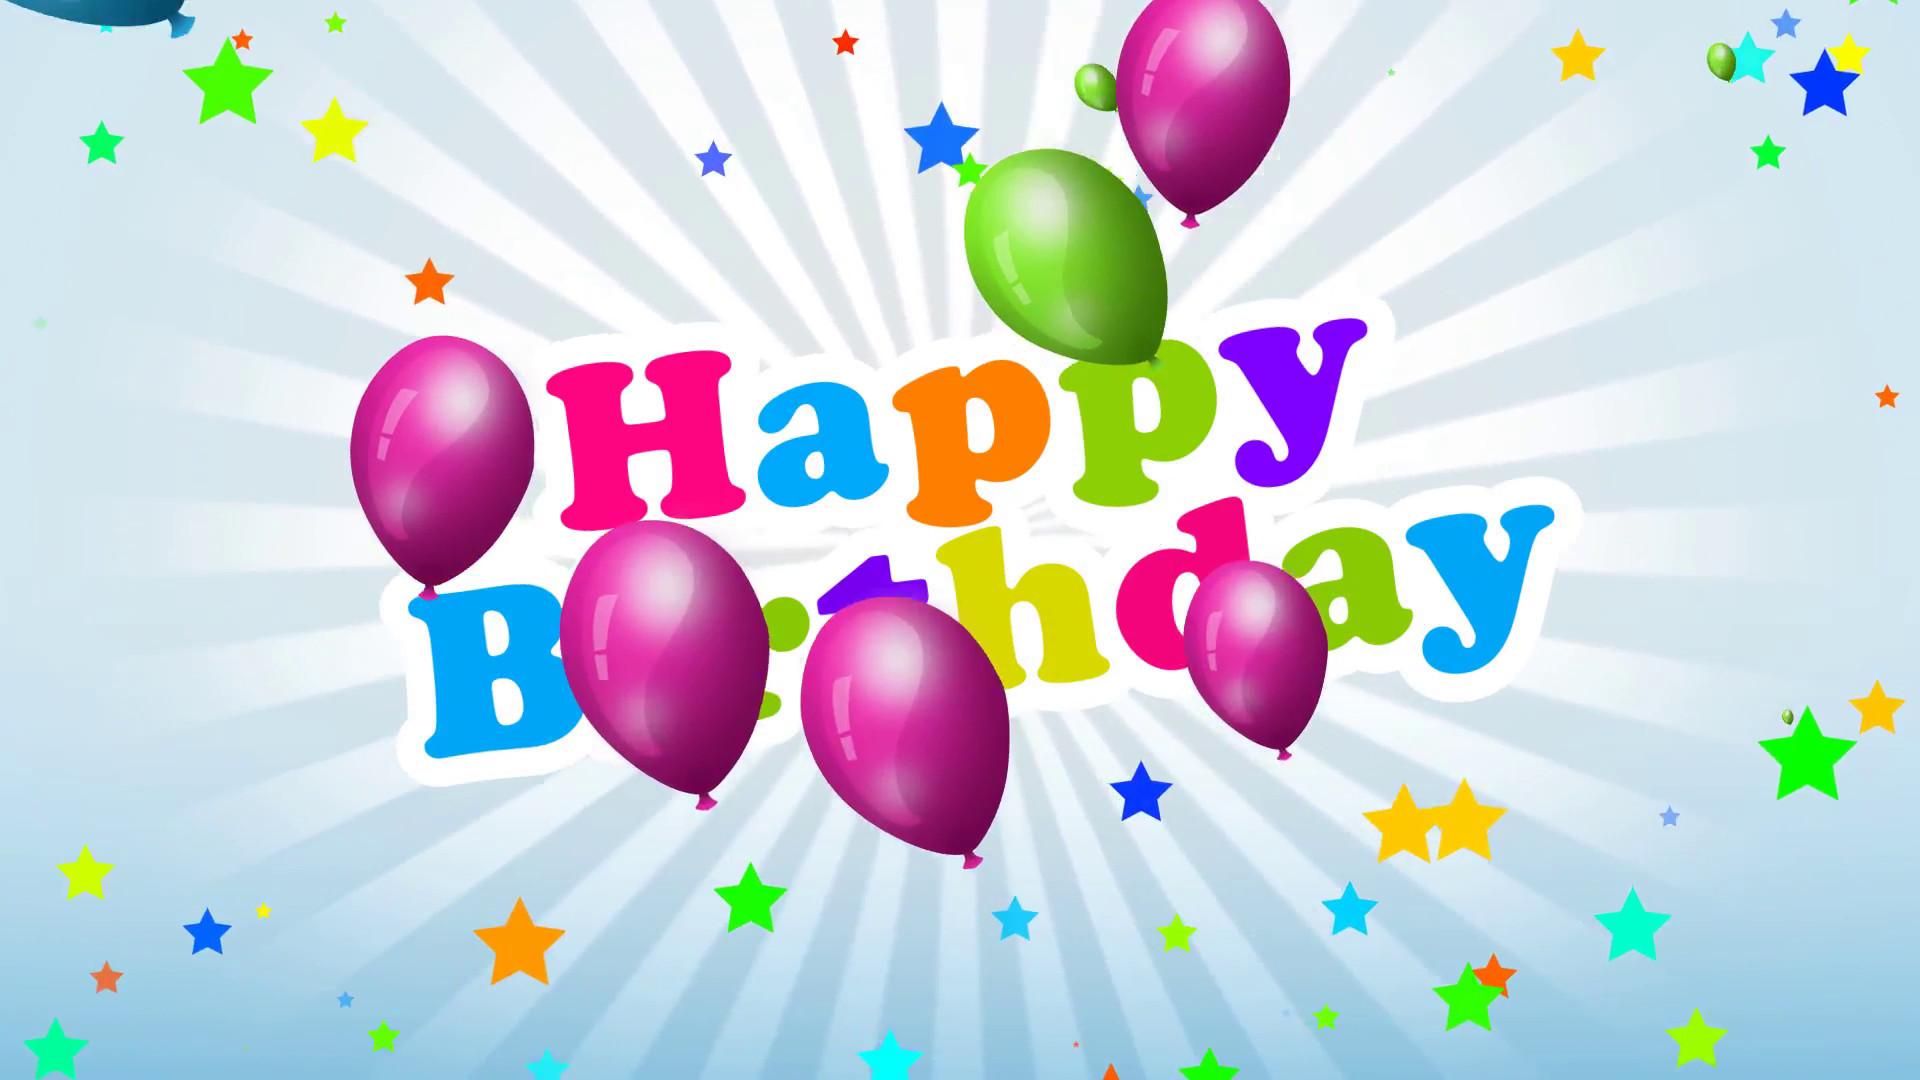 Happy Birthday Background Pictures 183 ①